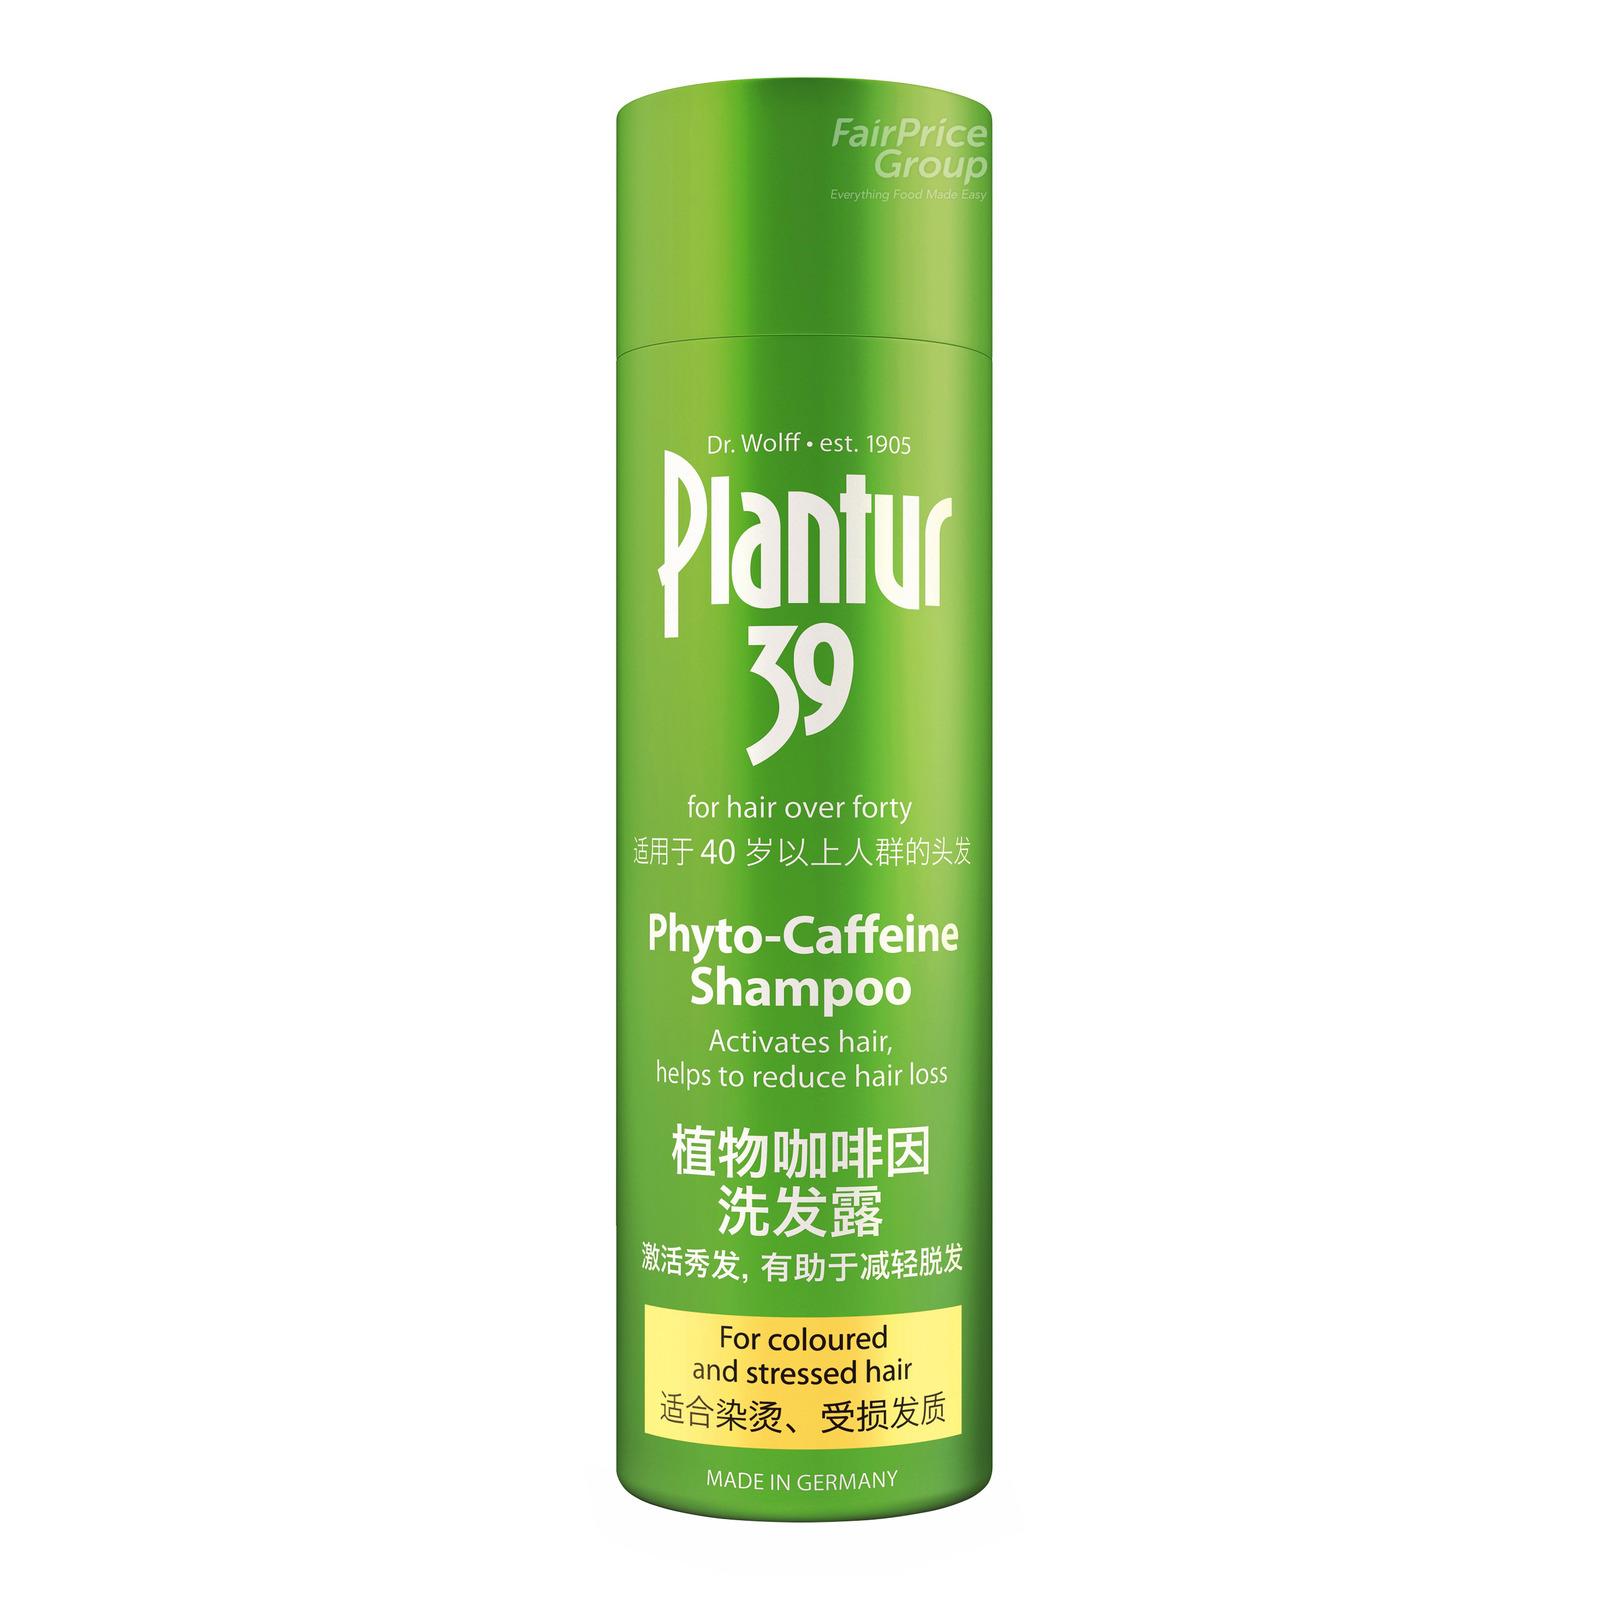 PLANTUR 39 phyto caffeine shampoo coloured and stressed hair 250ml